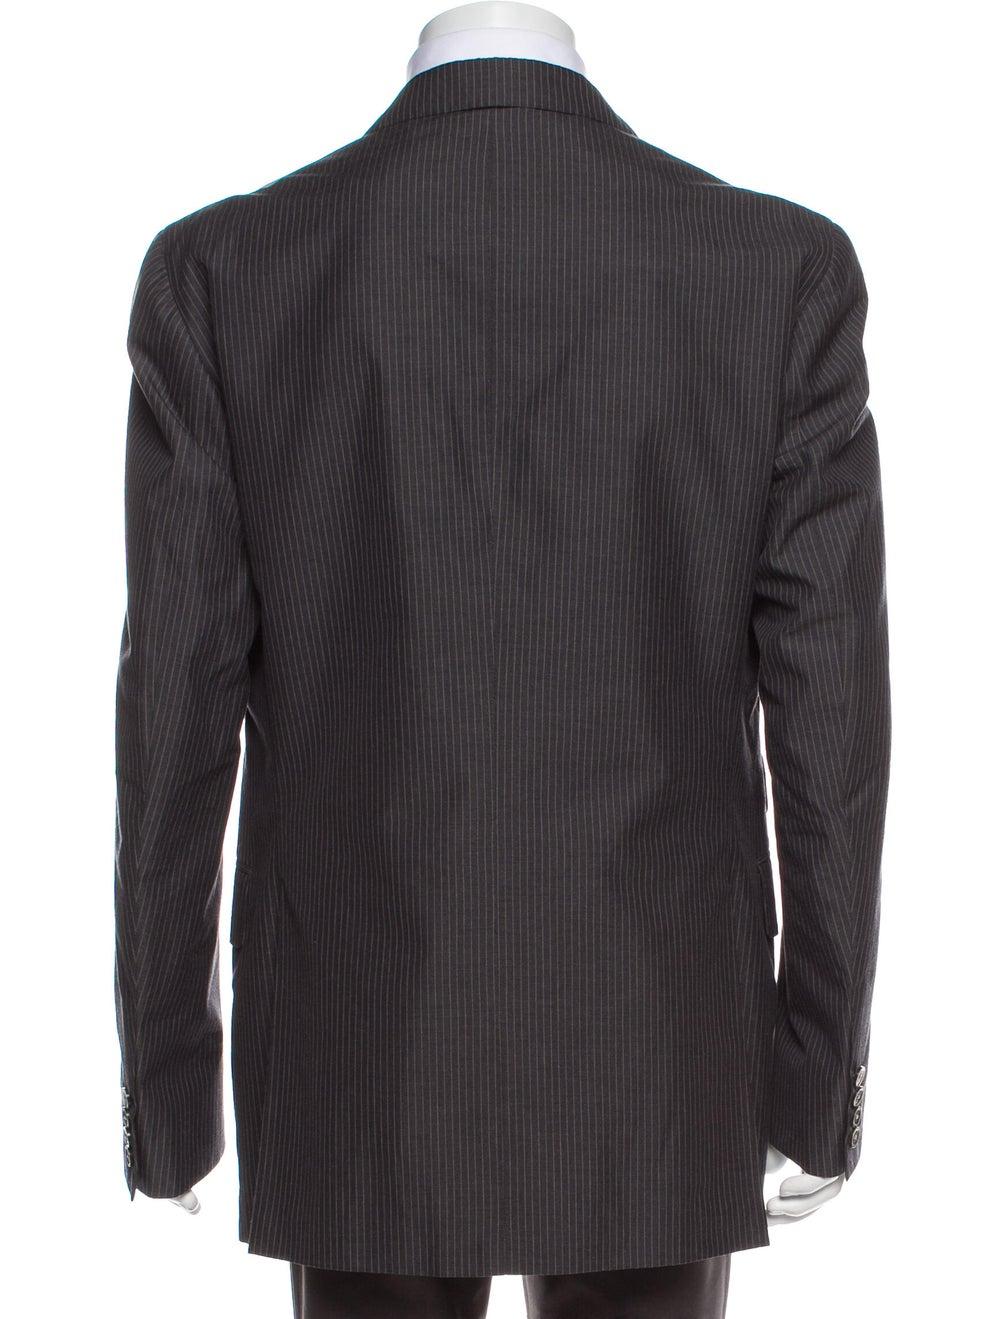 Boglioli Striped Two-Piece Suit Grey - image 3